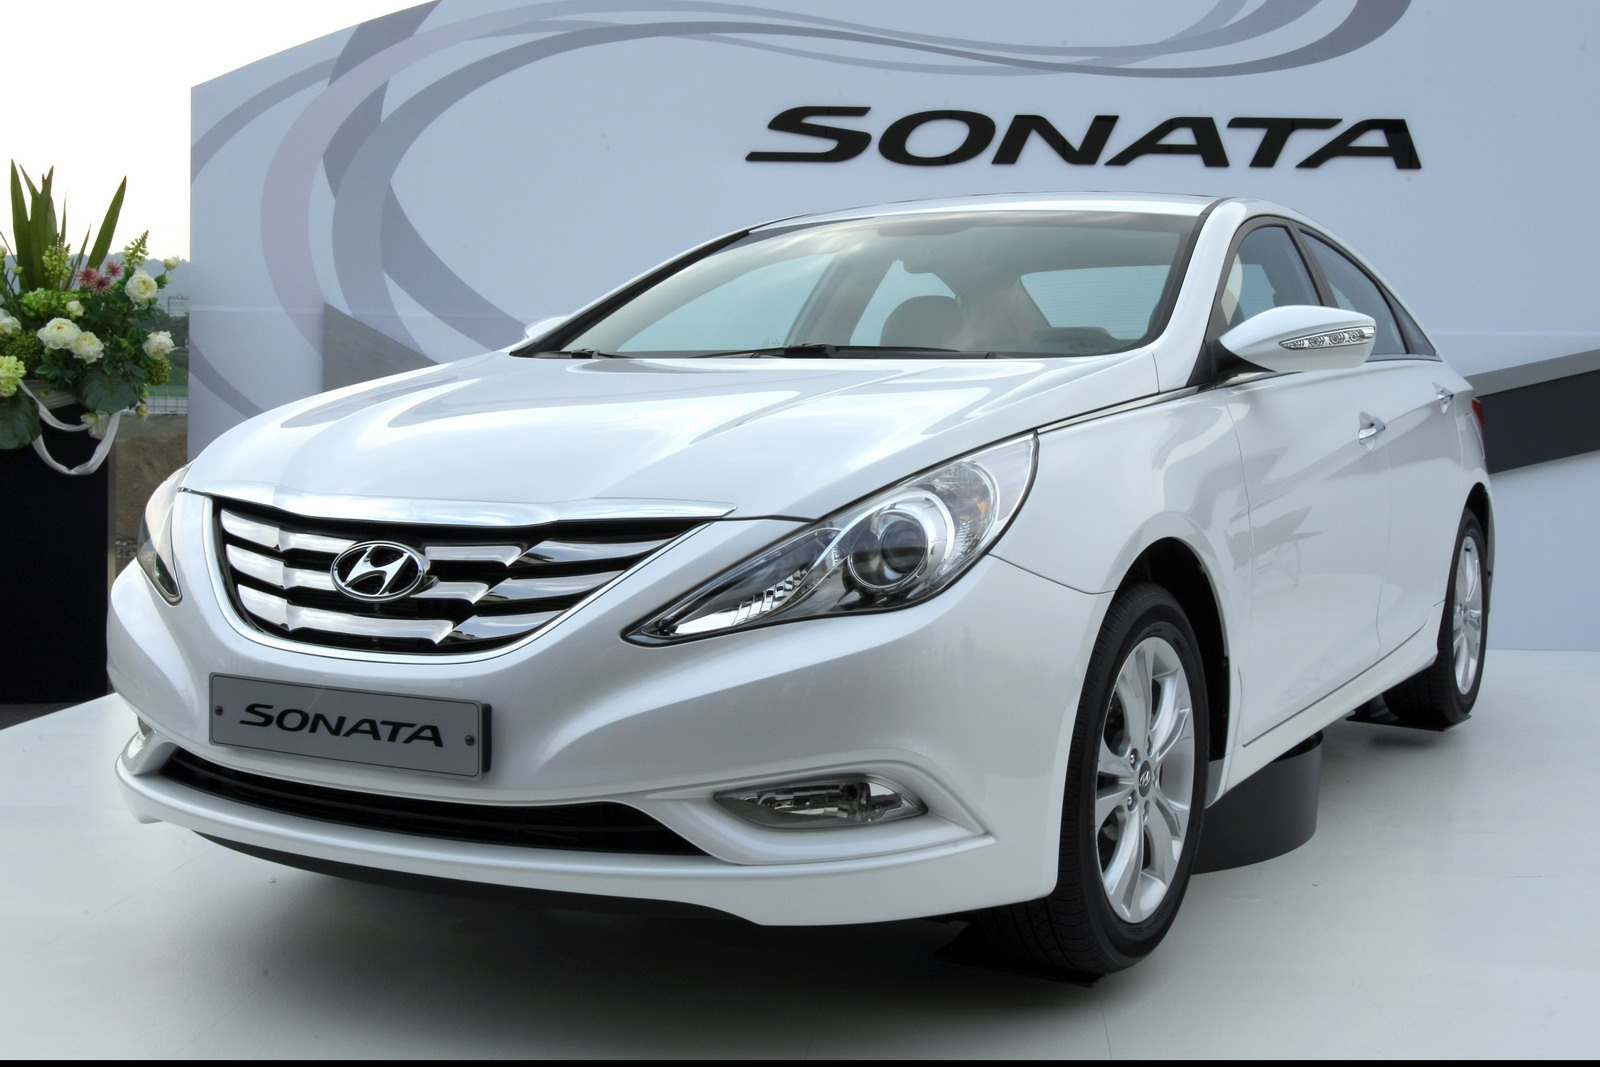 New Hyundai Sonata 2012